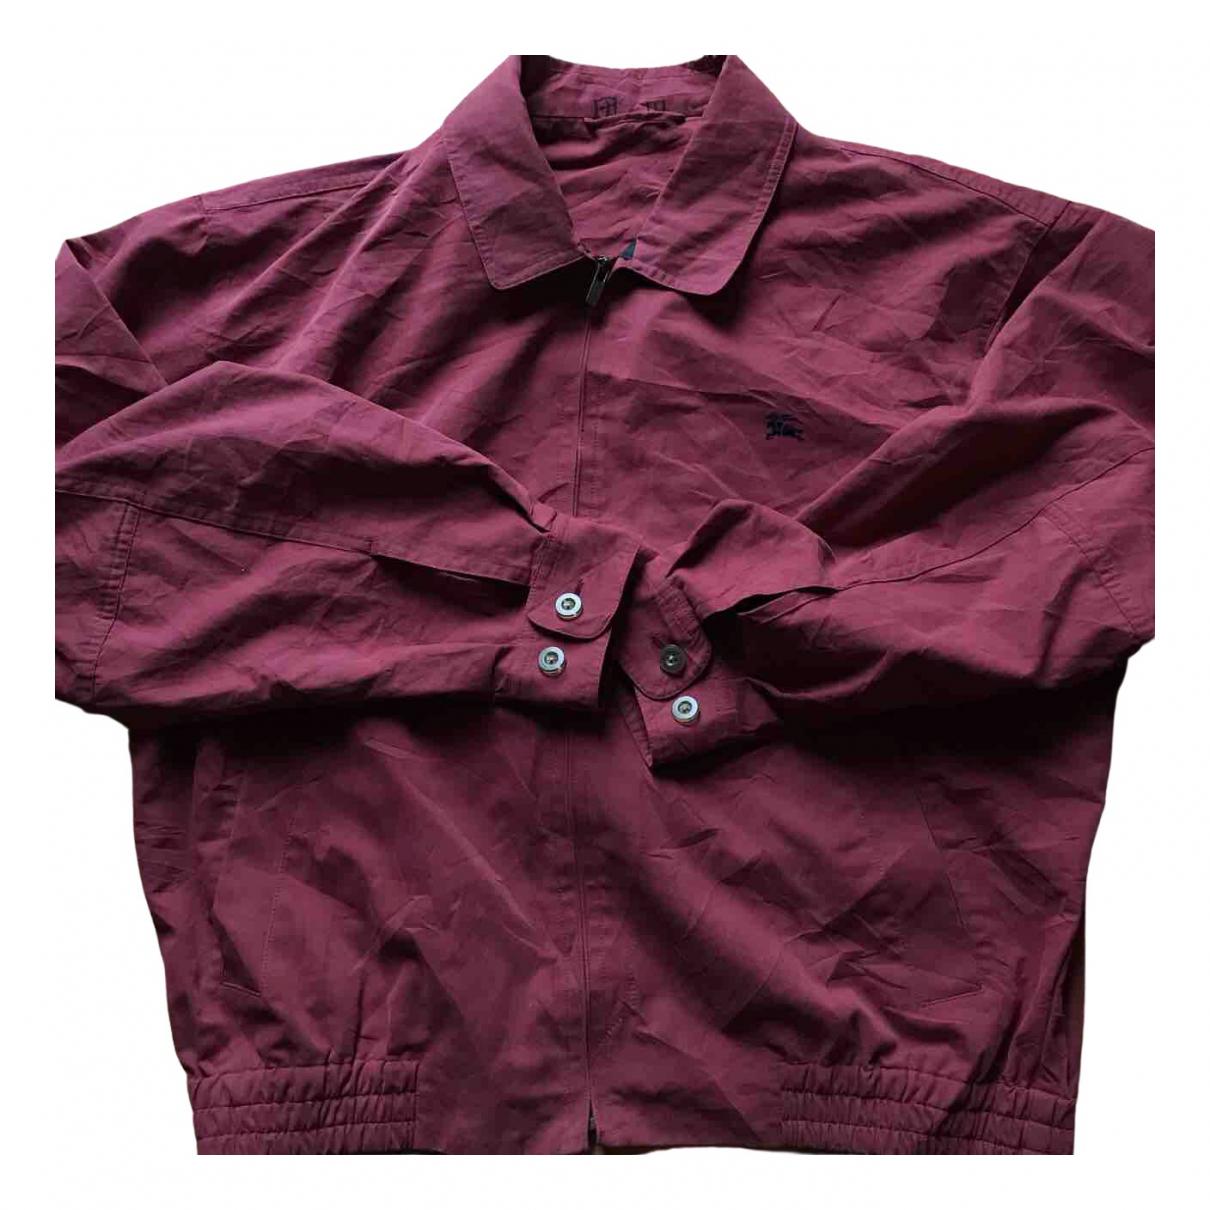 Burberry \N Burgundy Cotton jacket  for Men M International